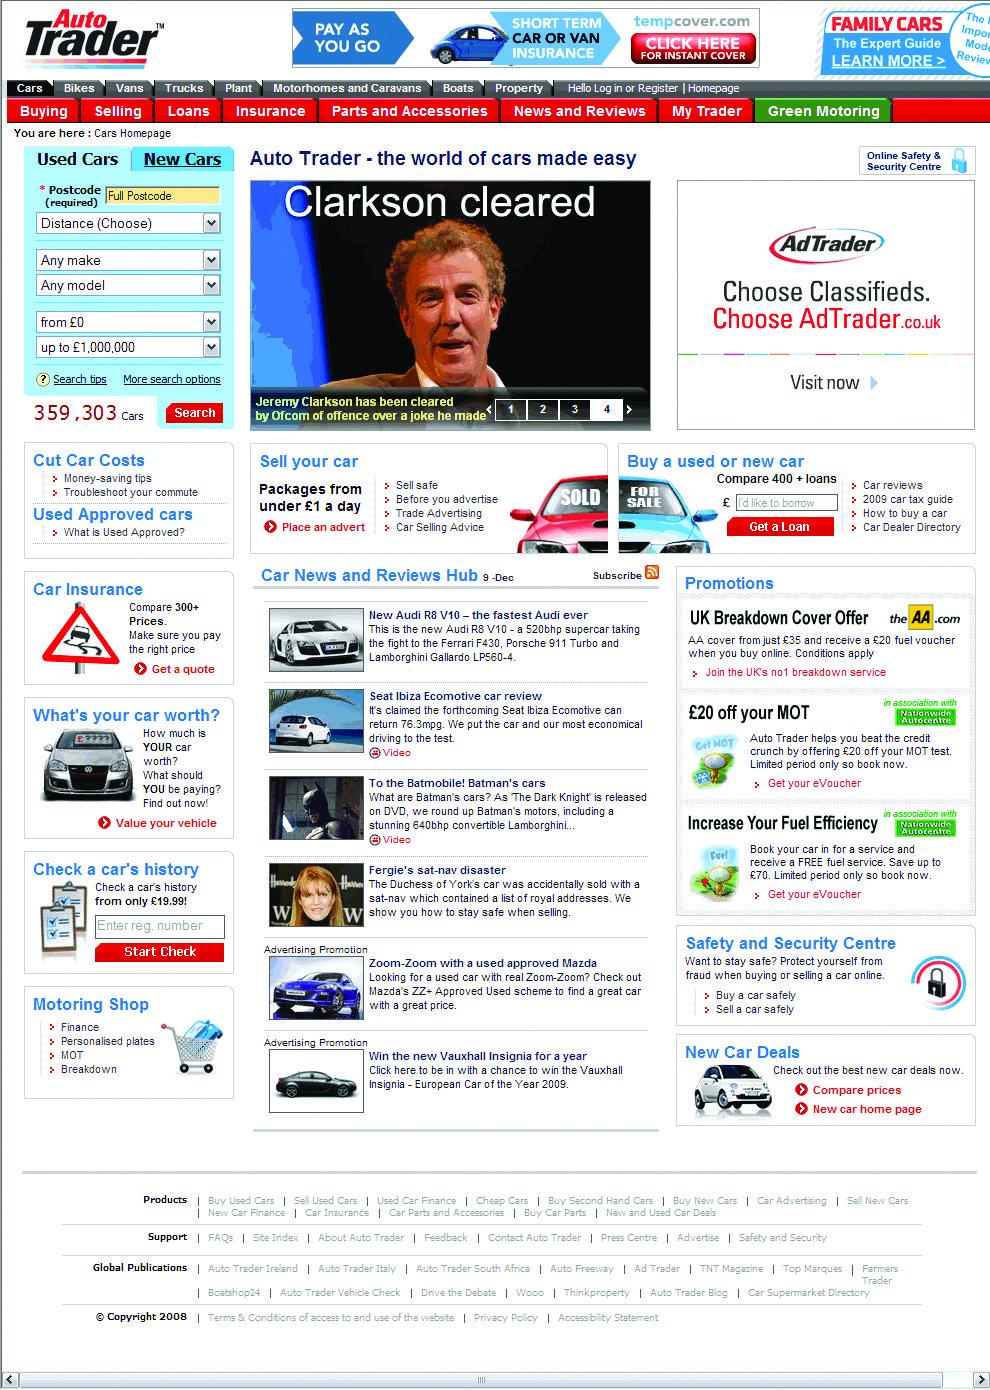 2008 AutoTrader.co.uk homepage | Auto Trader Heritage | Pinterest | Cars